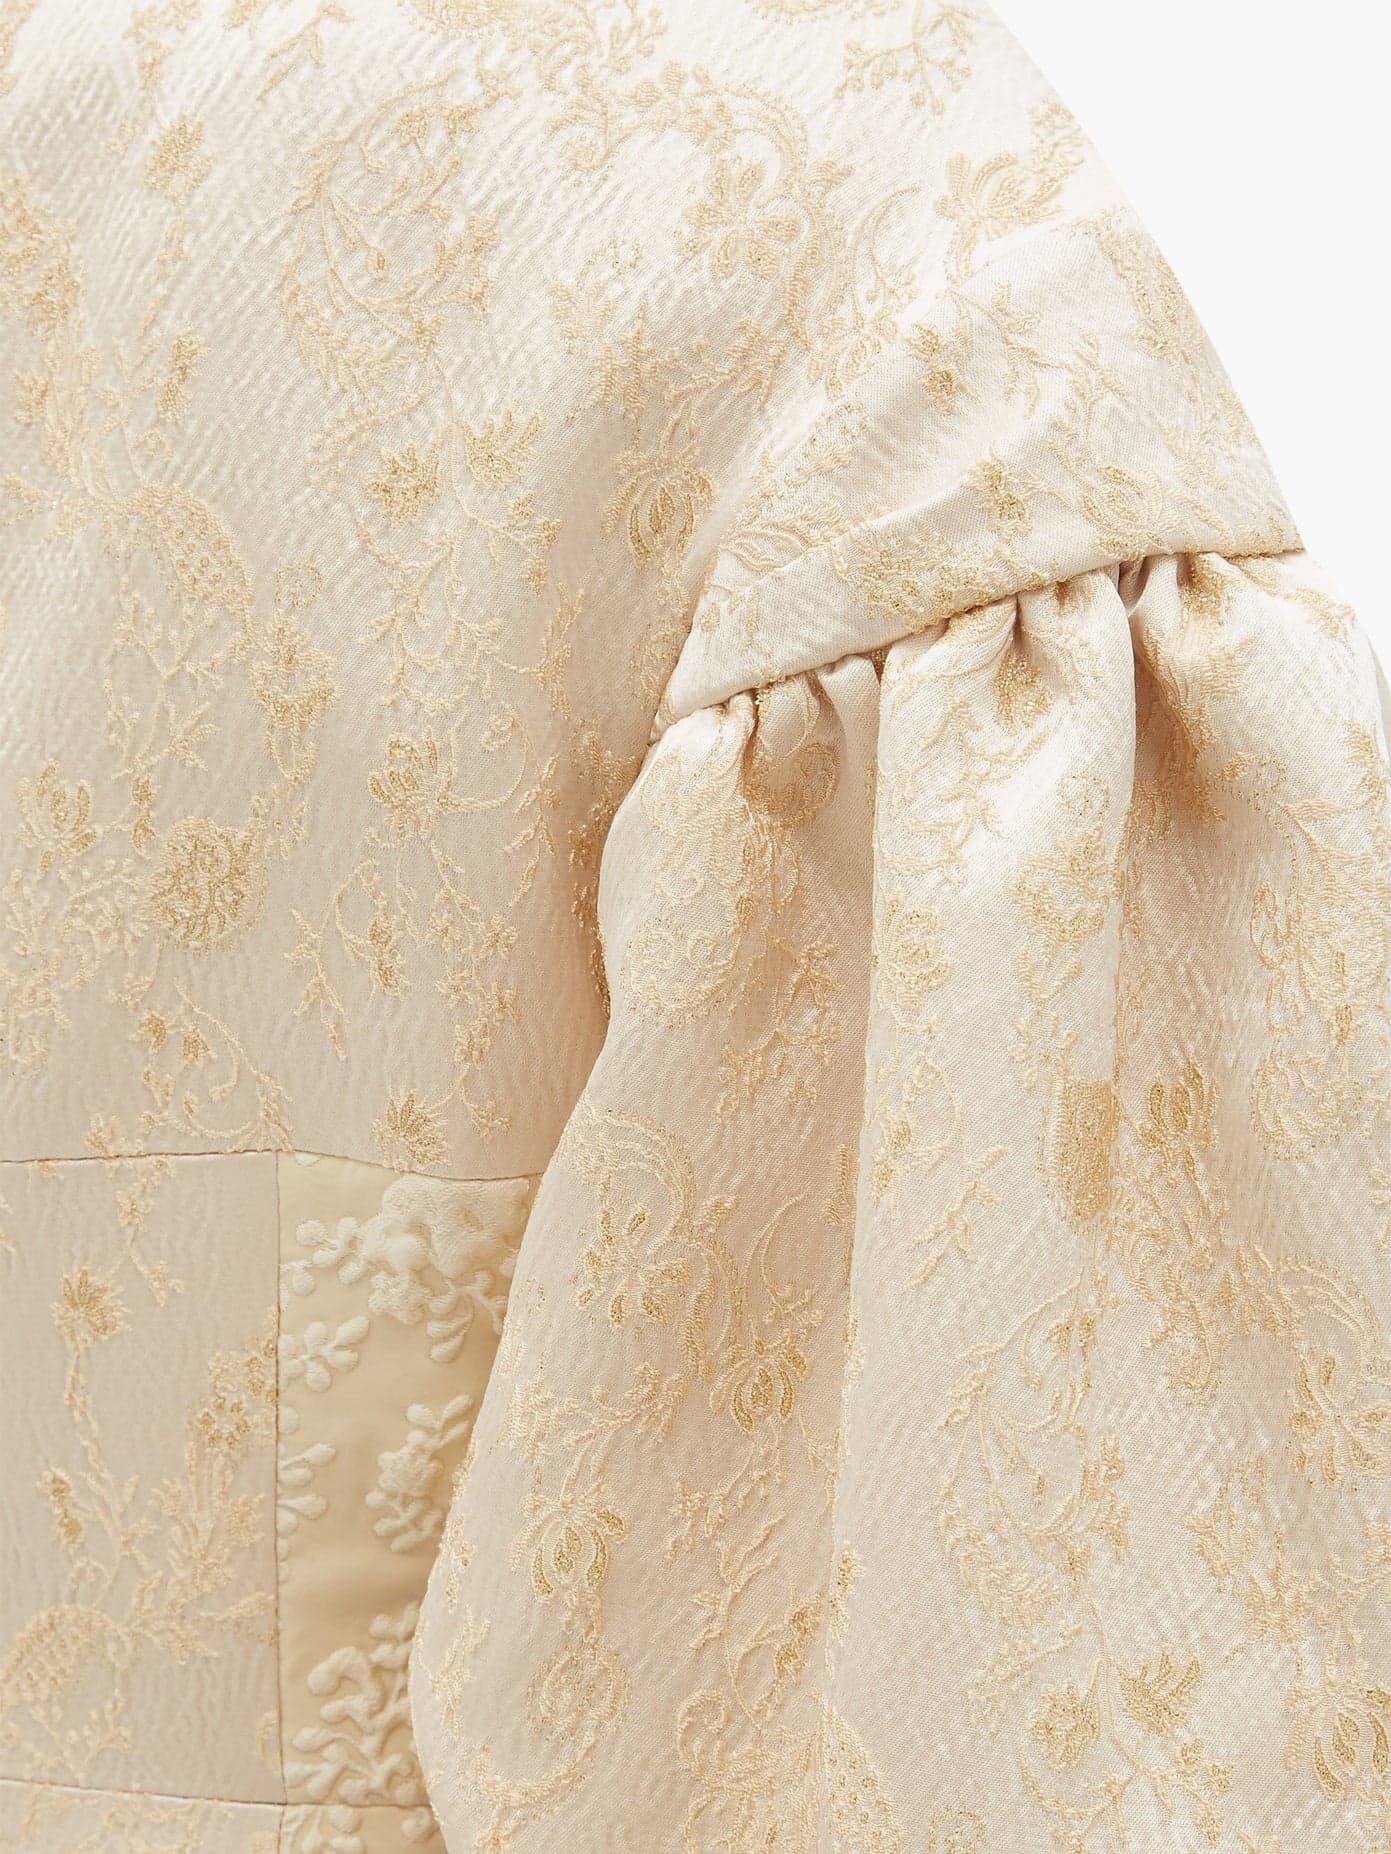 Simone Rocha Gathered Sleeves Cream Dress Detail